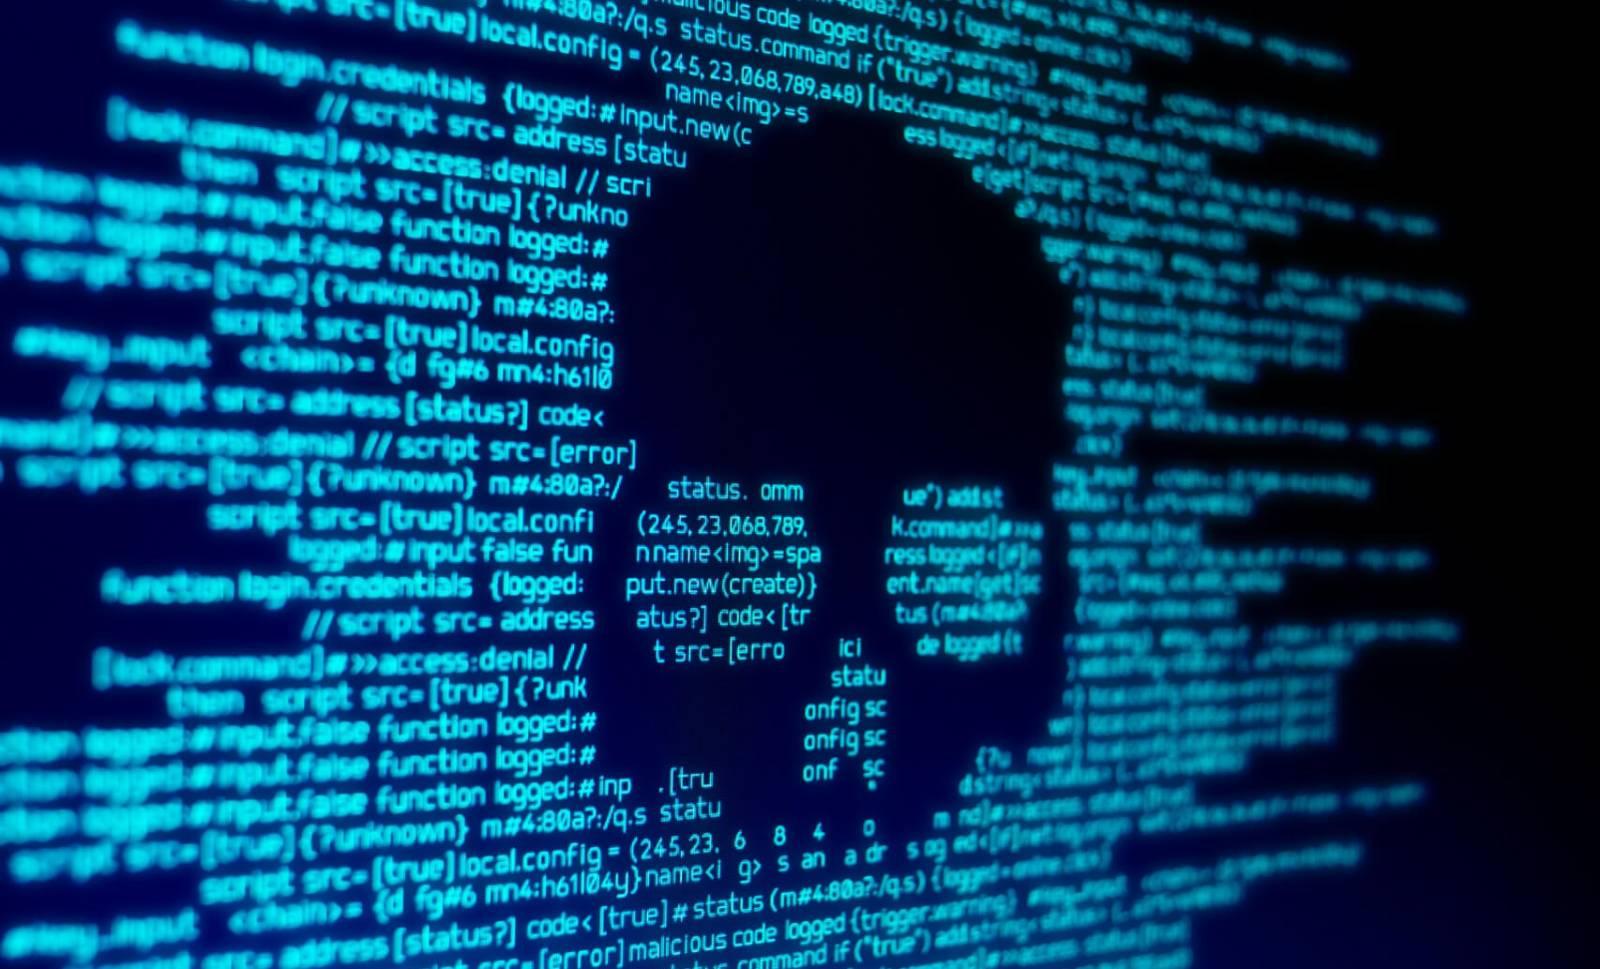 android ios zynga hack